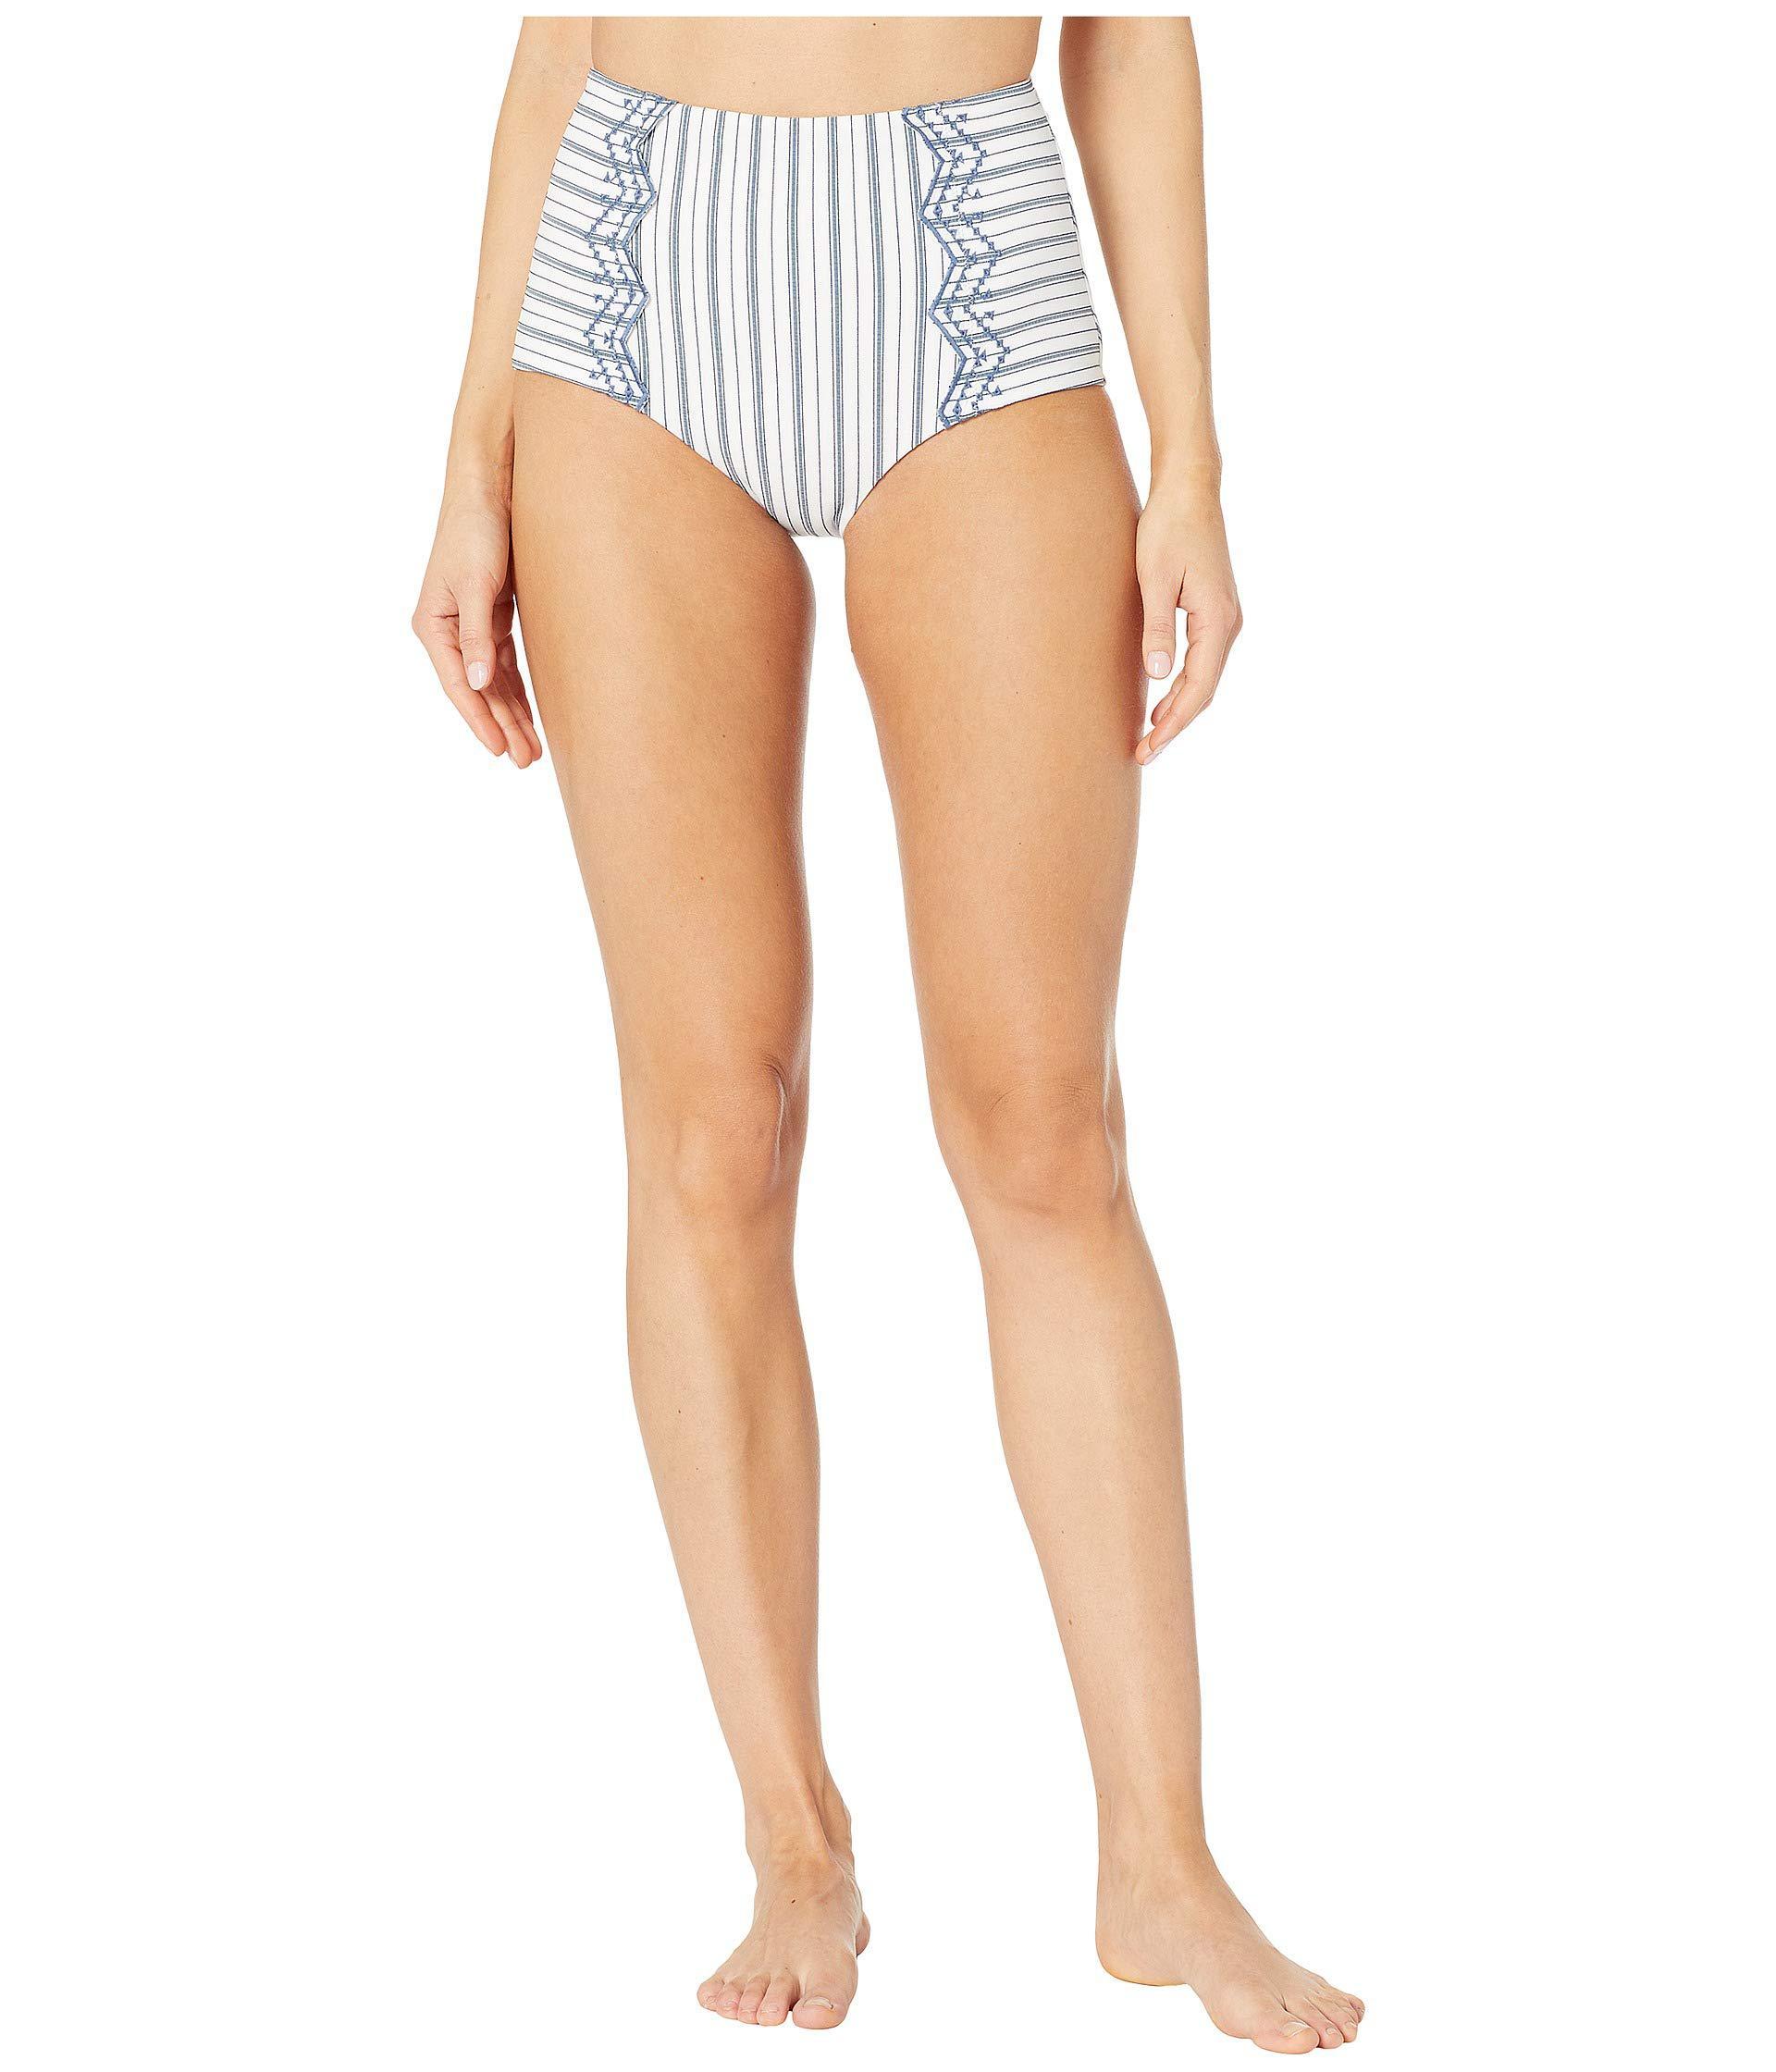 ca45c7de4ecf6 Lyst - Seafolly High-waisted Pant (white) Women's Swimwear in White